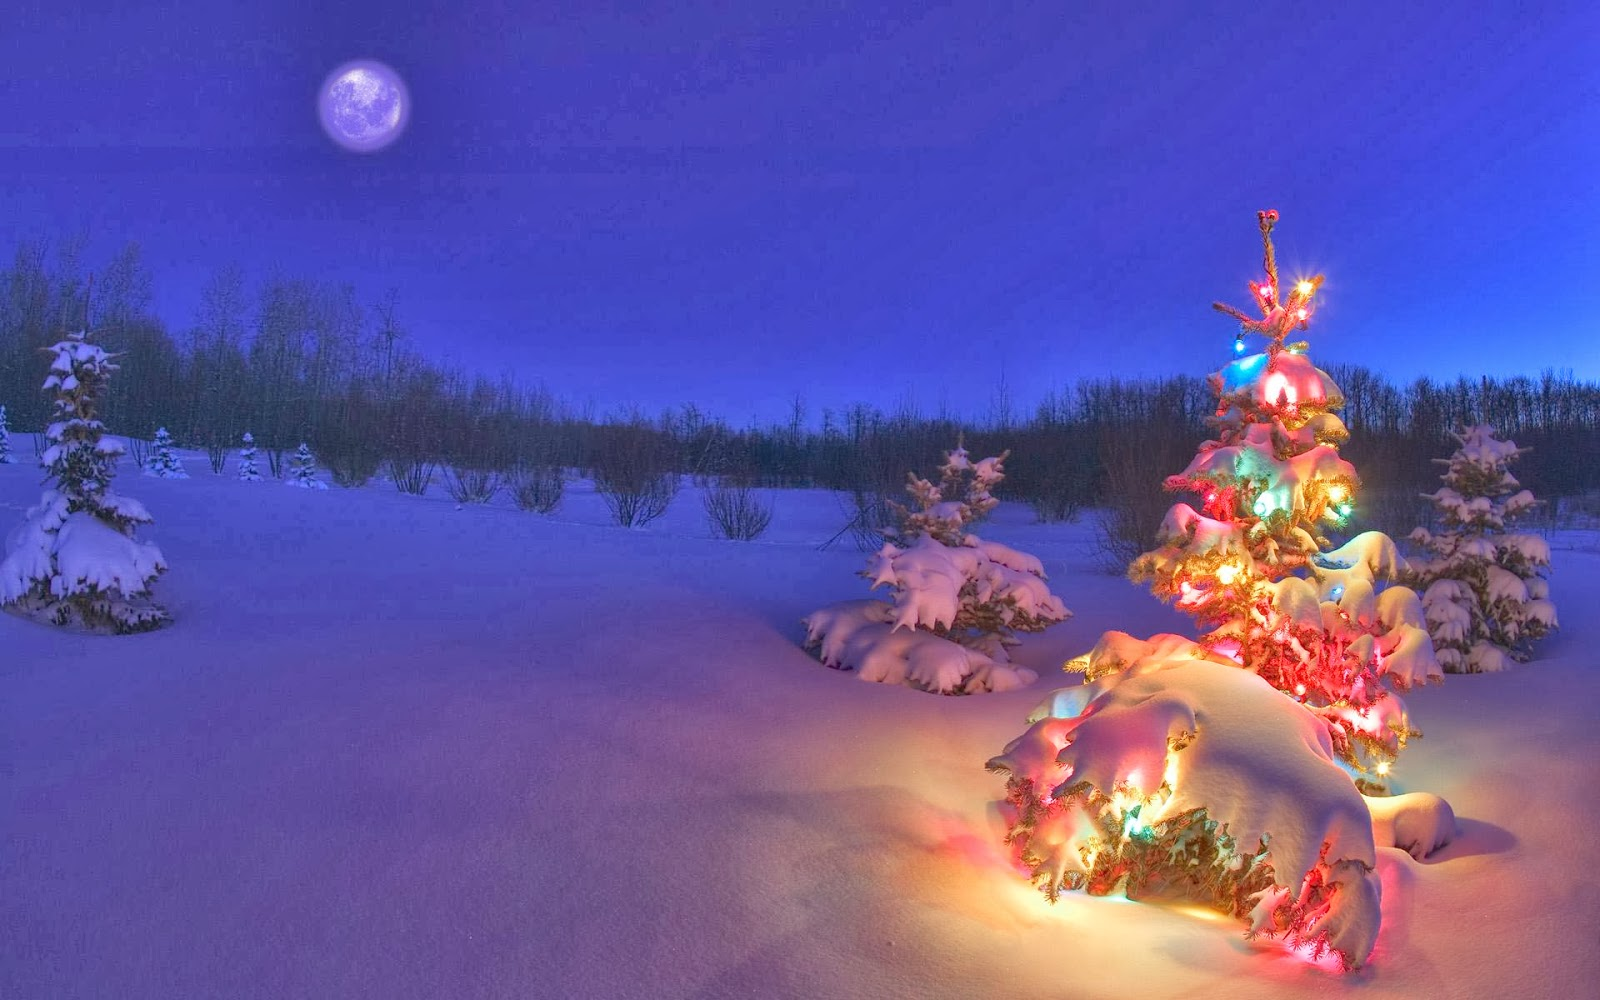 ♥★One day... PARADISE ★♥ - Página 39 Postales-navide%C3%B1as-con-arbolitos-o-pinitos-de-Navidad-Christmas-tree-+%289%29